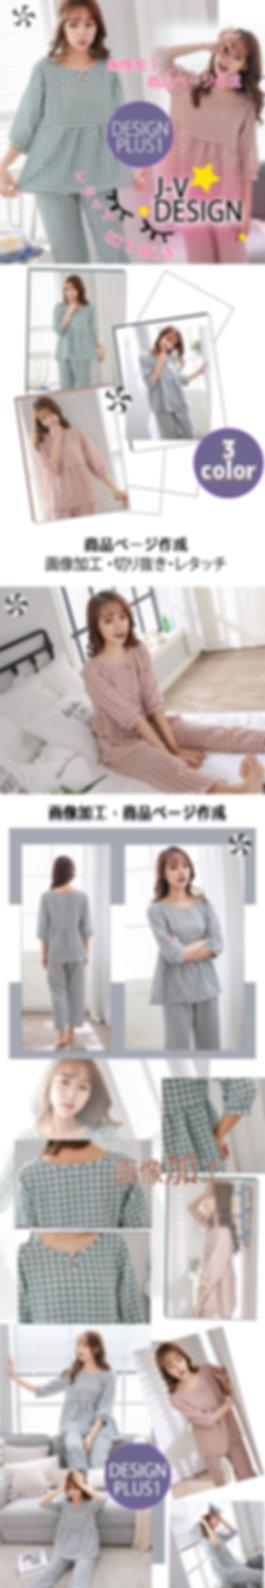 example_13.jpg